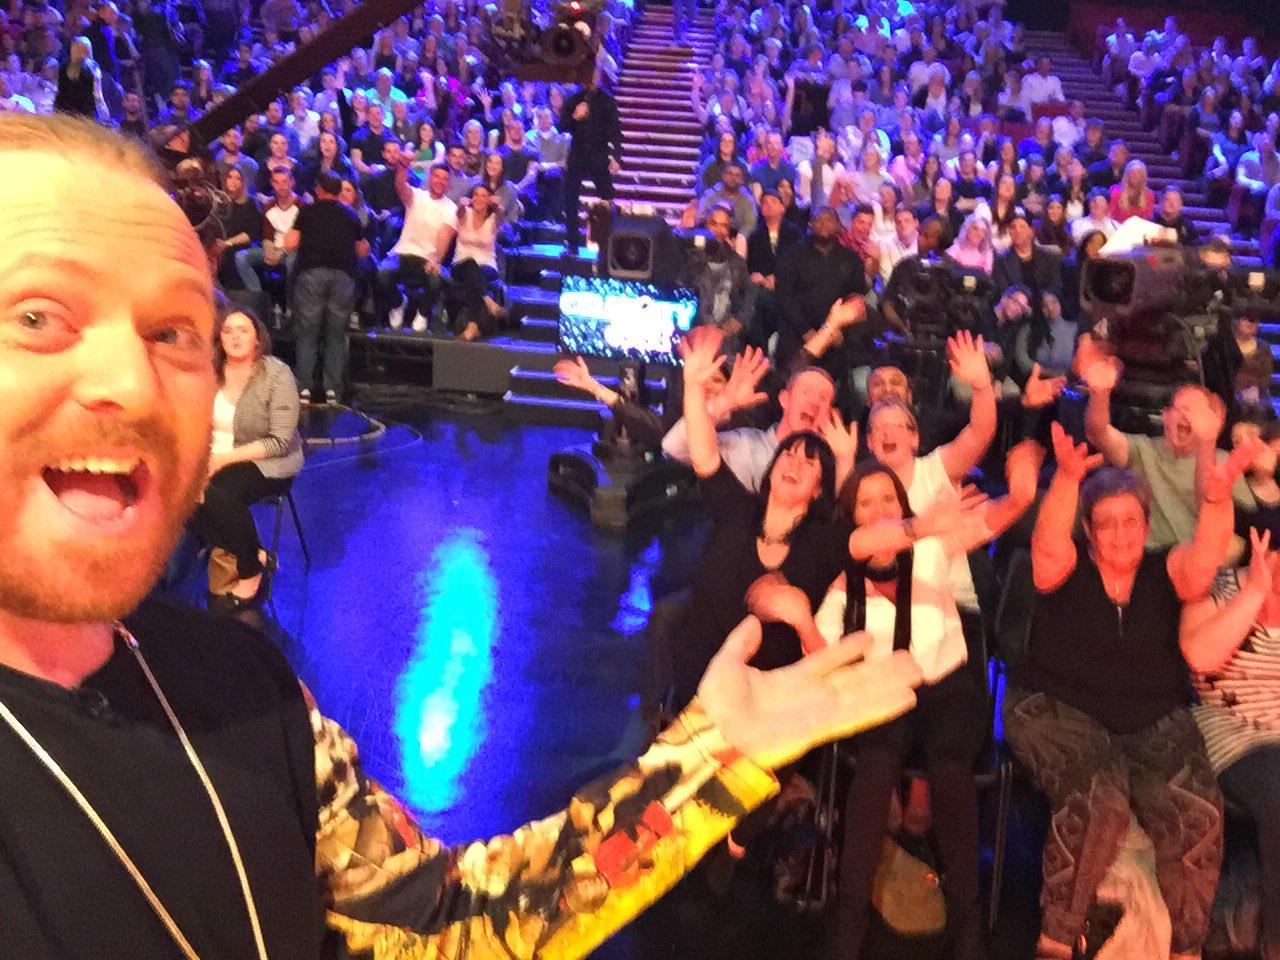 Great audience last night. Juice 10pm tonight! @itv2 https://t.co/Eo6WBdZEl4